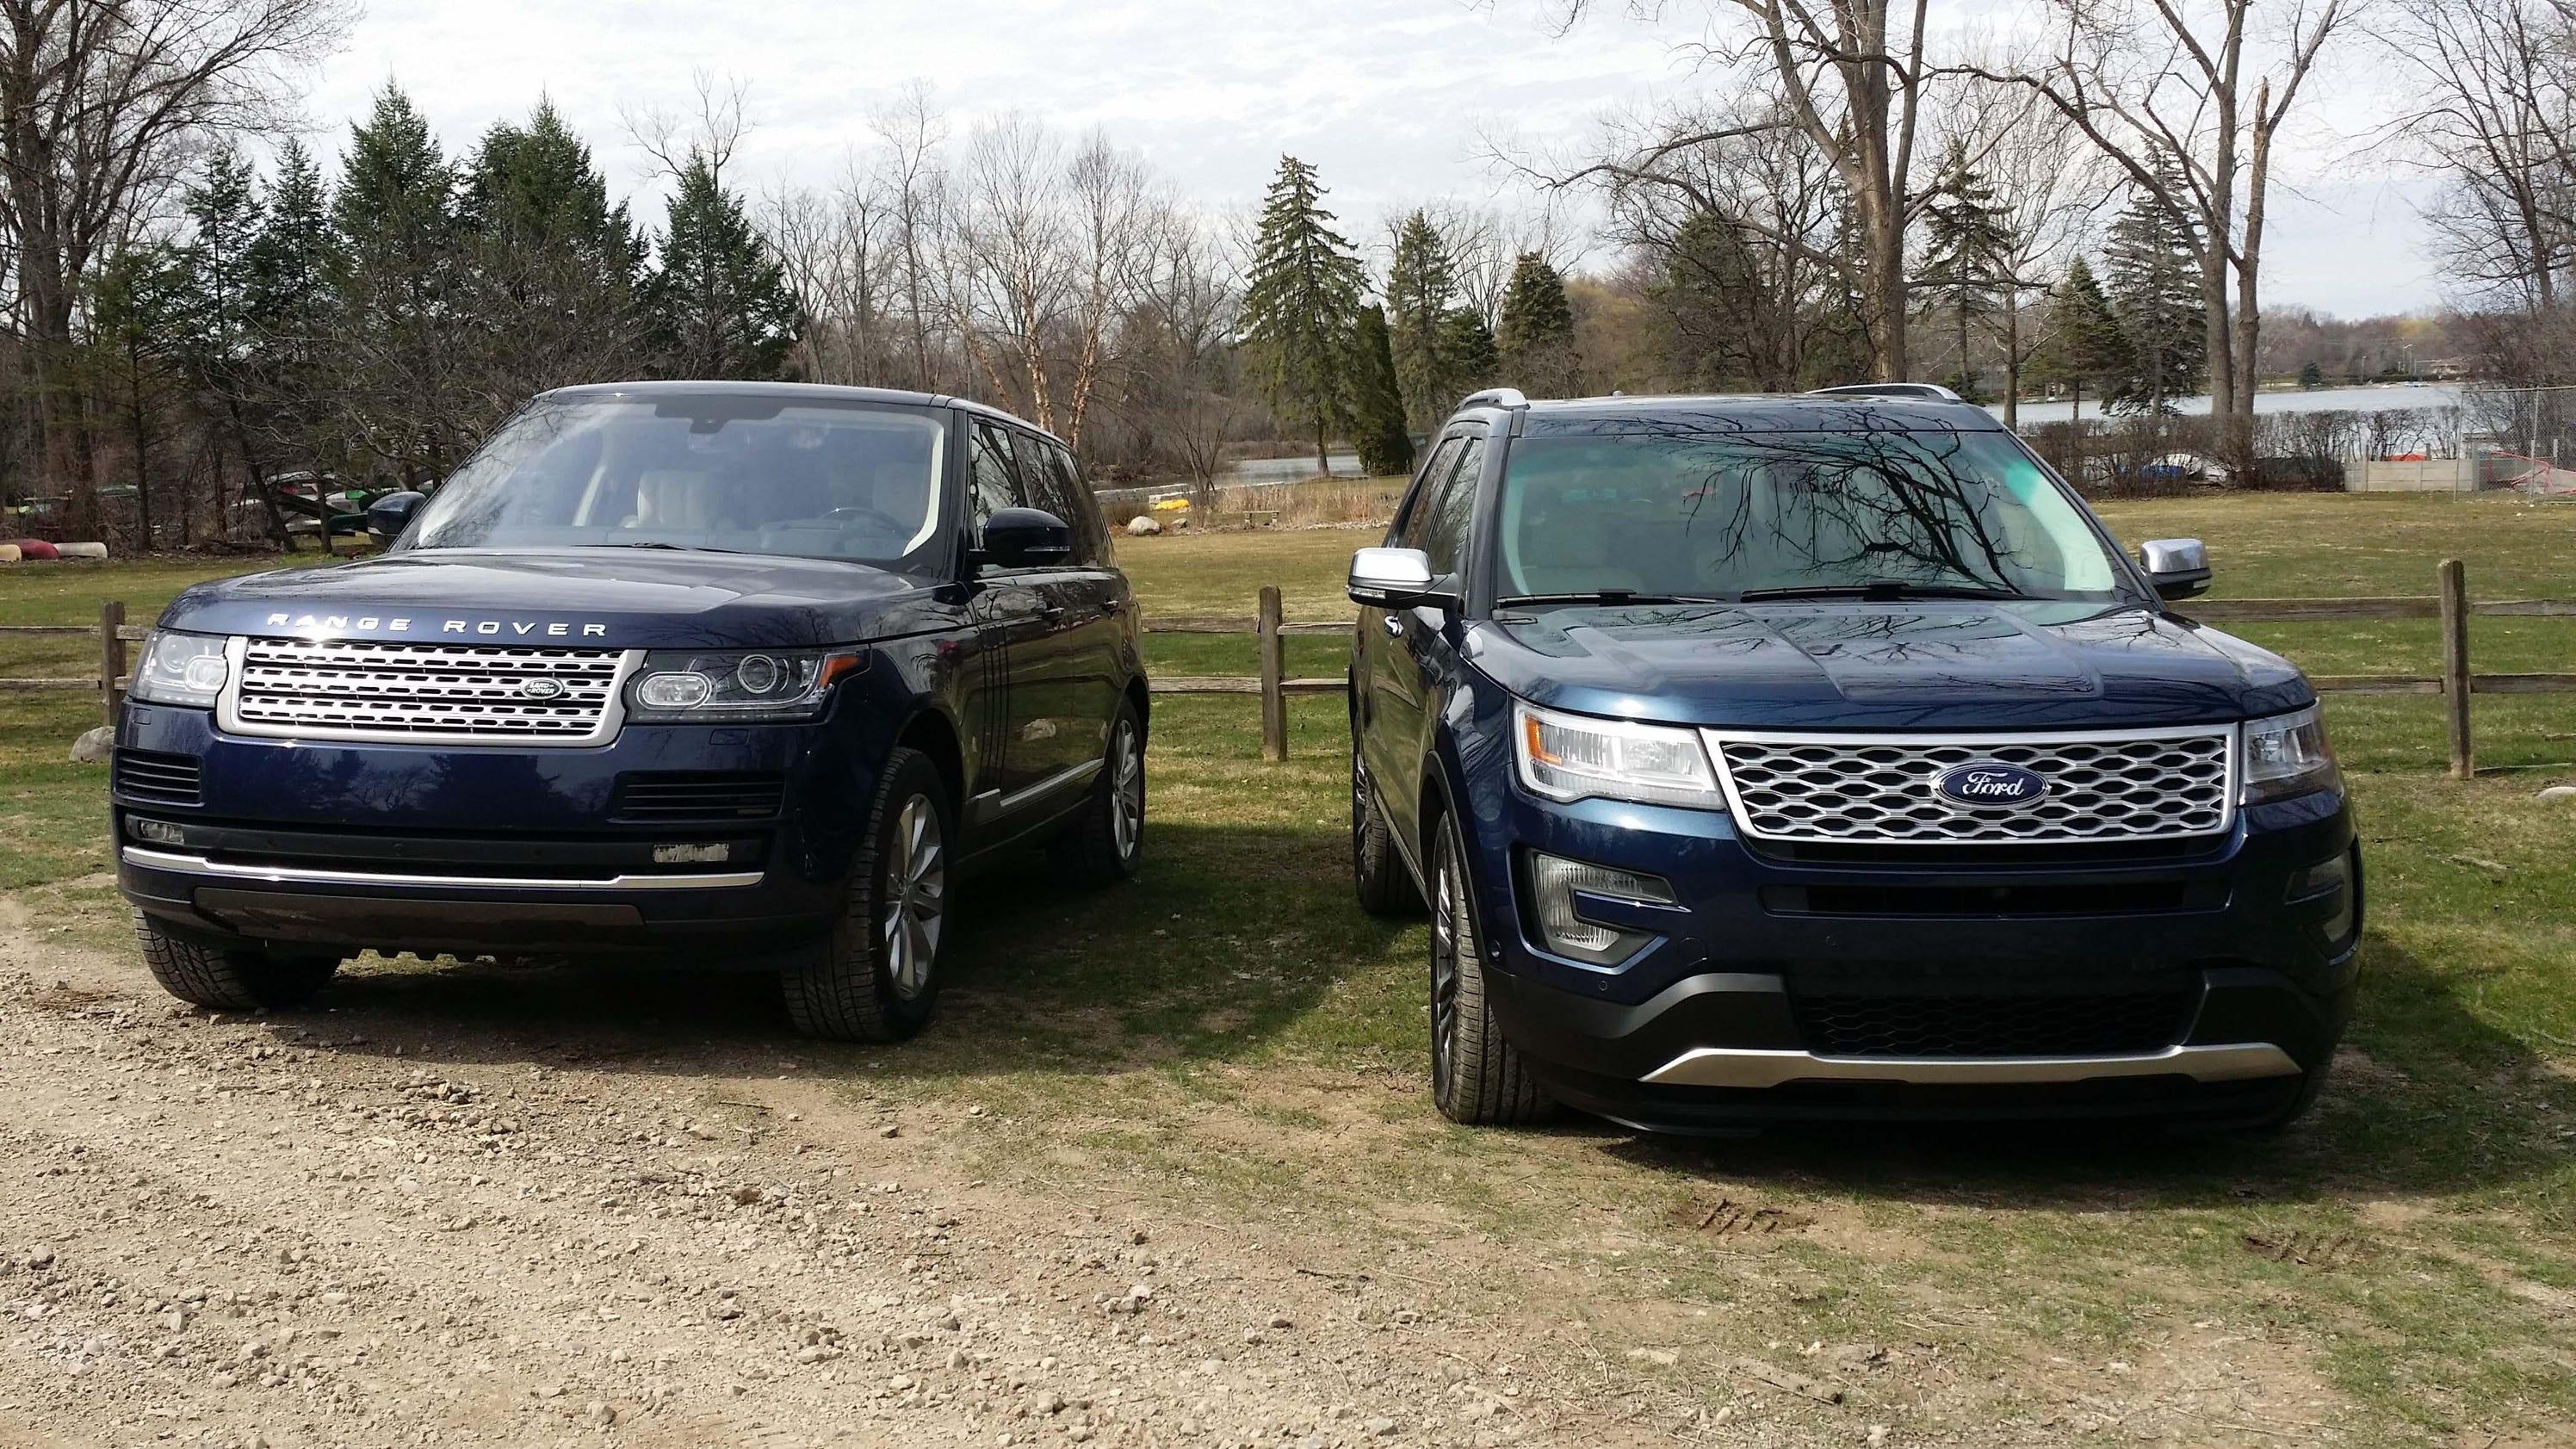 Range Rover Vs Explorer Platinum